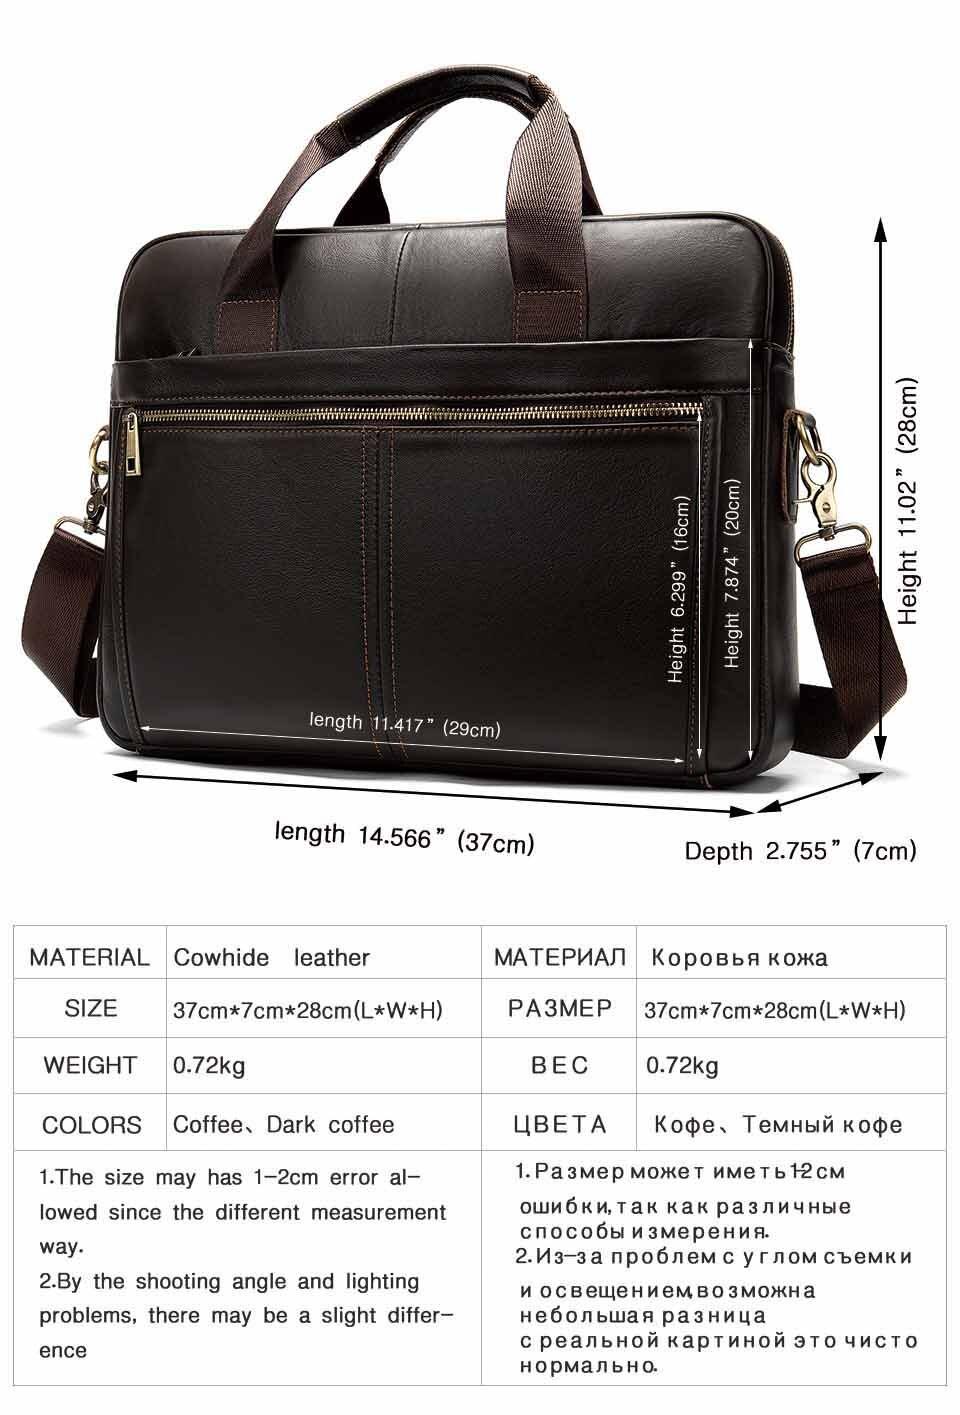 LAZYLIFE-briefcase-messenger-bag-men-s-genuine-leather-14-laptop-bag-men-s-briefcases-office-business (5)